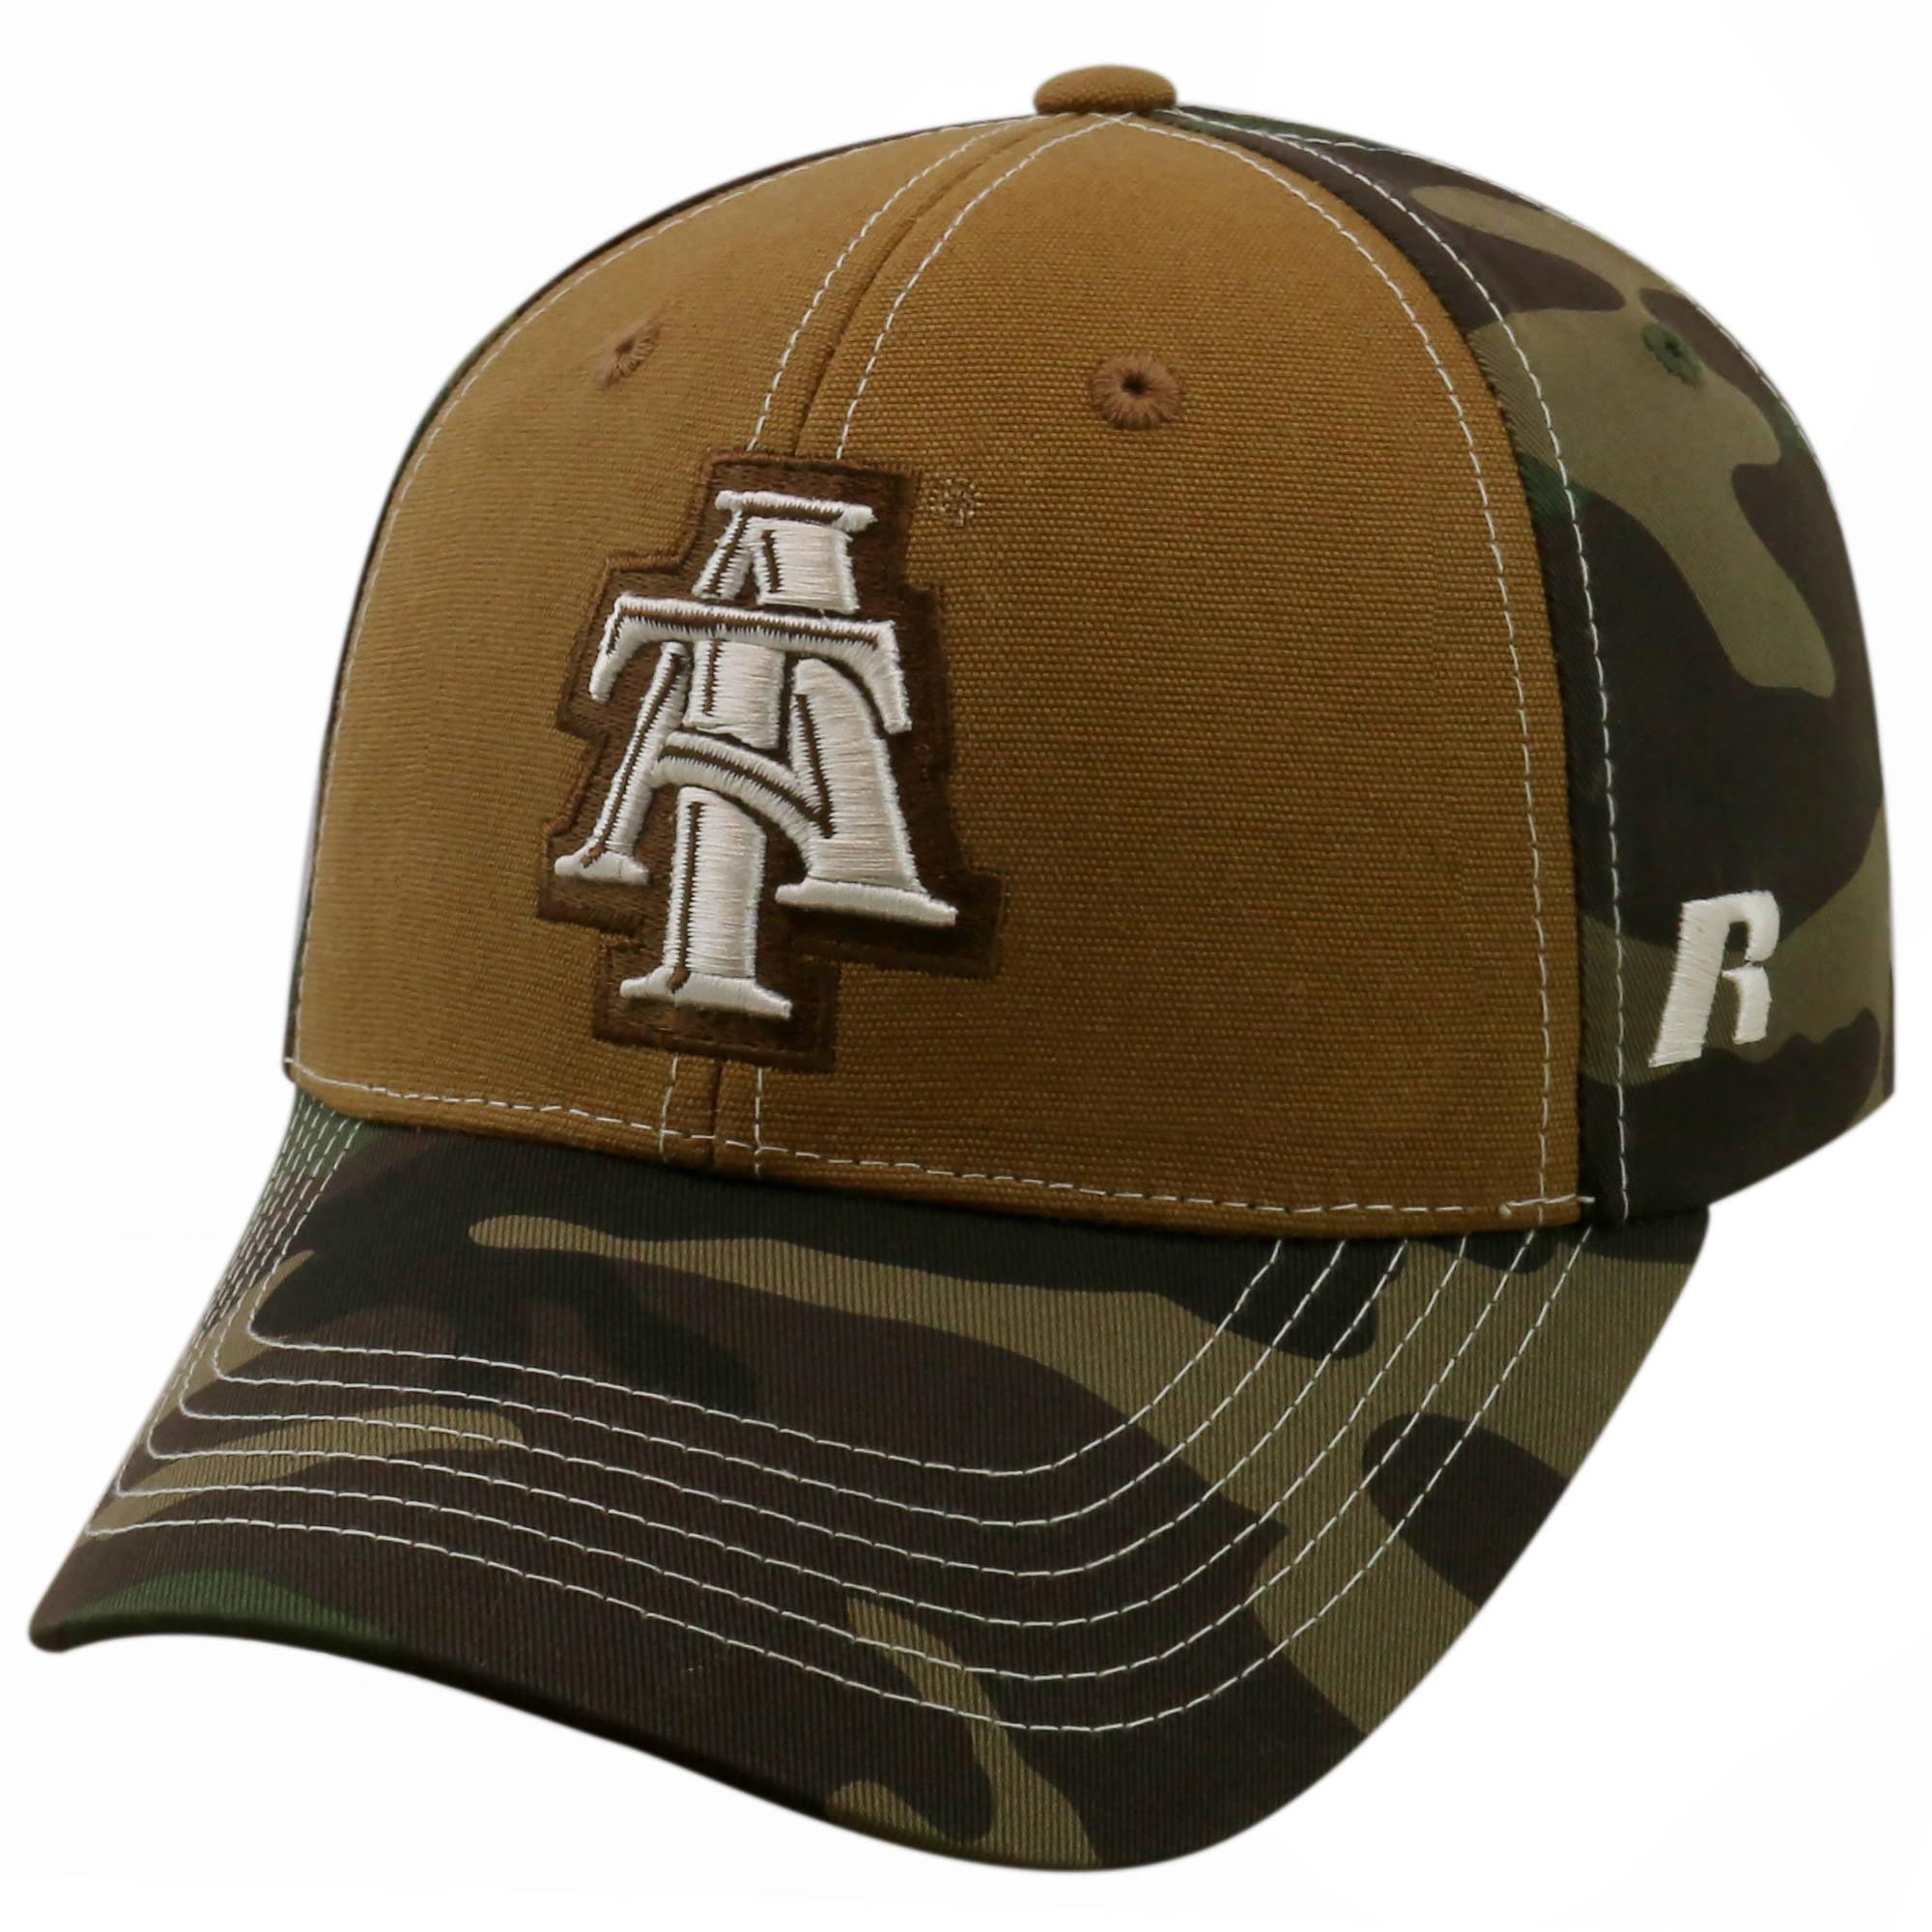 University Of North Carolina A&T Aggies Mossy Baseball Cap